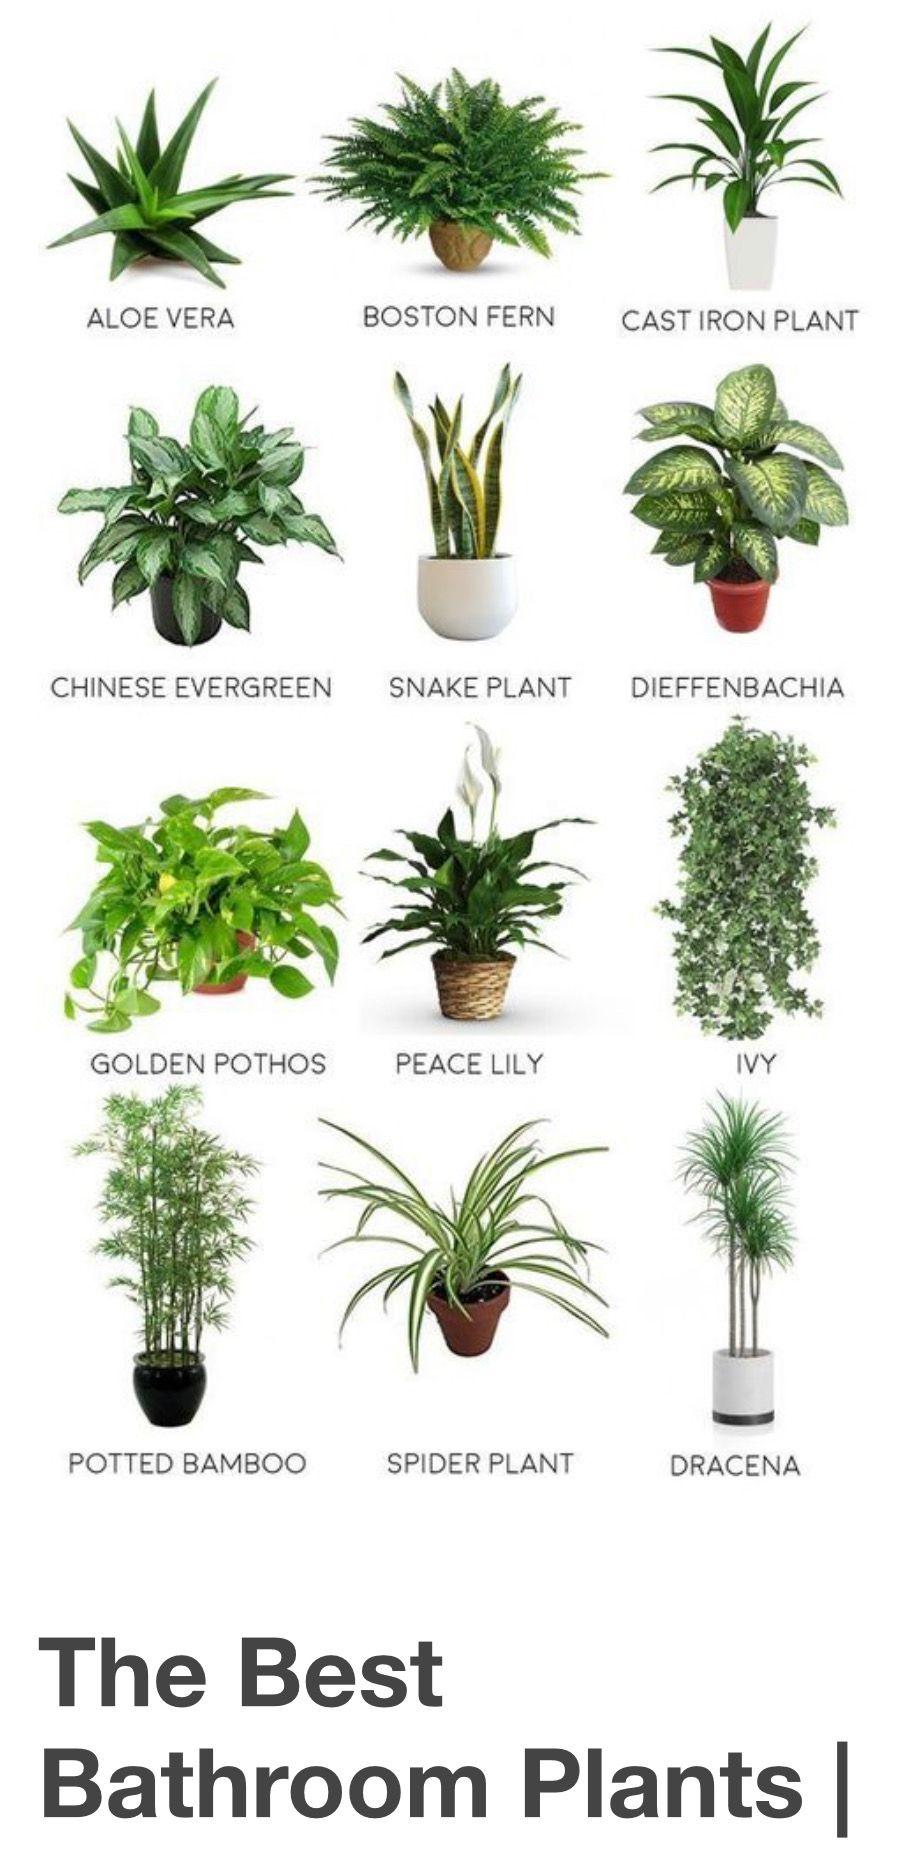 Pin By Leticia Baca Razo On Plant Shop Plants Best Bathroom Plants Plant Decor Indoor